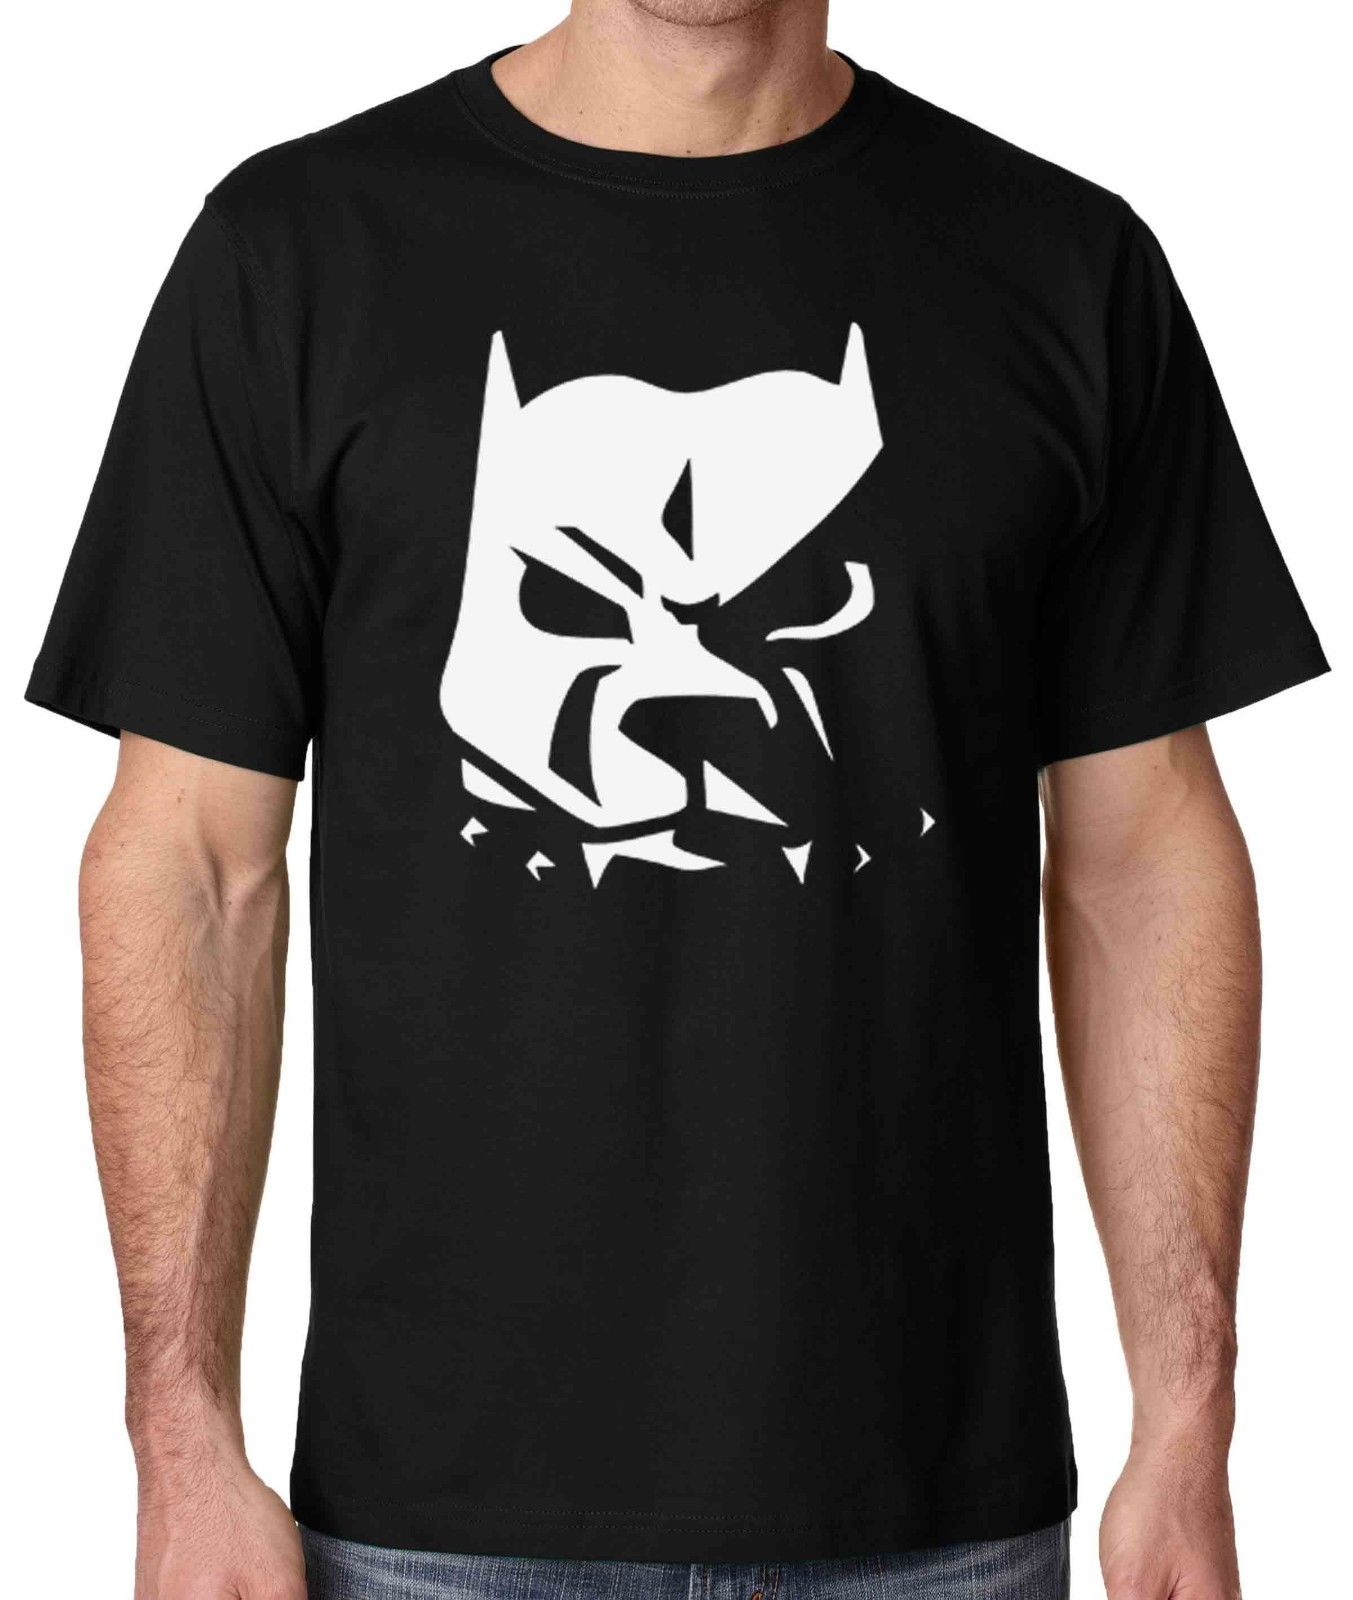 ФРС Pit Bull Face Мужская Pitbull футболка хулигана рубашка Размеры Sm 5X футболка Стиль Винтаж Тис Забавный футболка